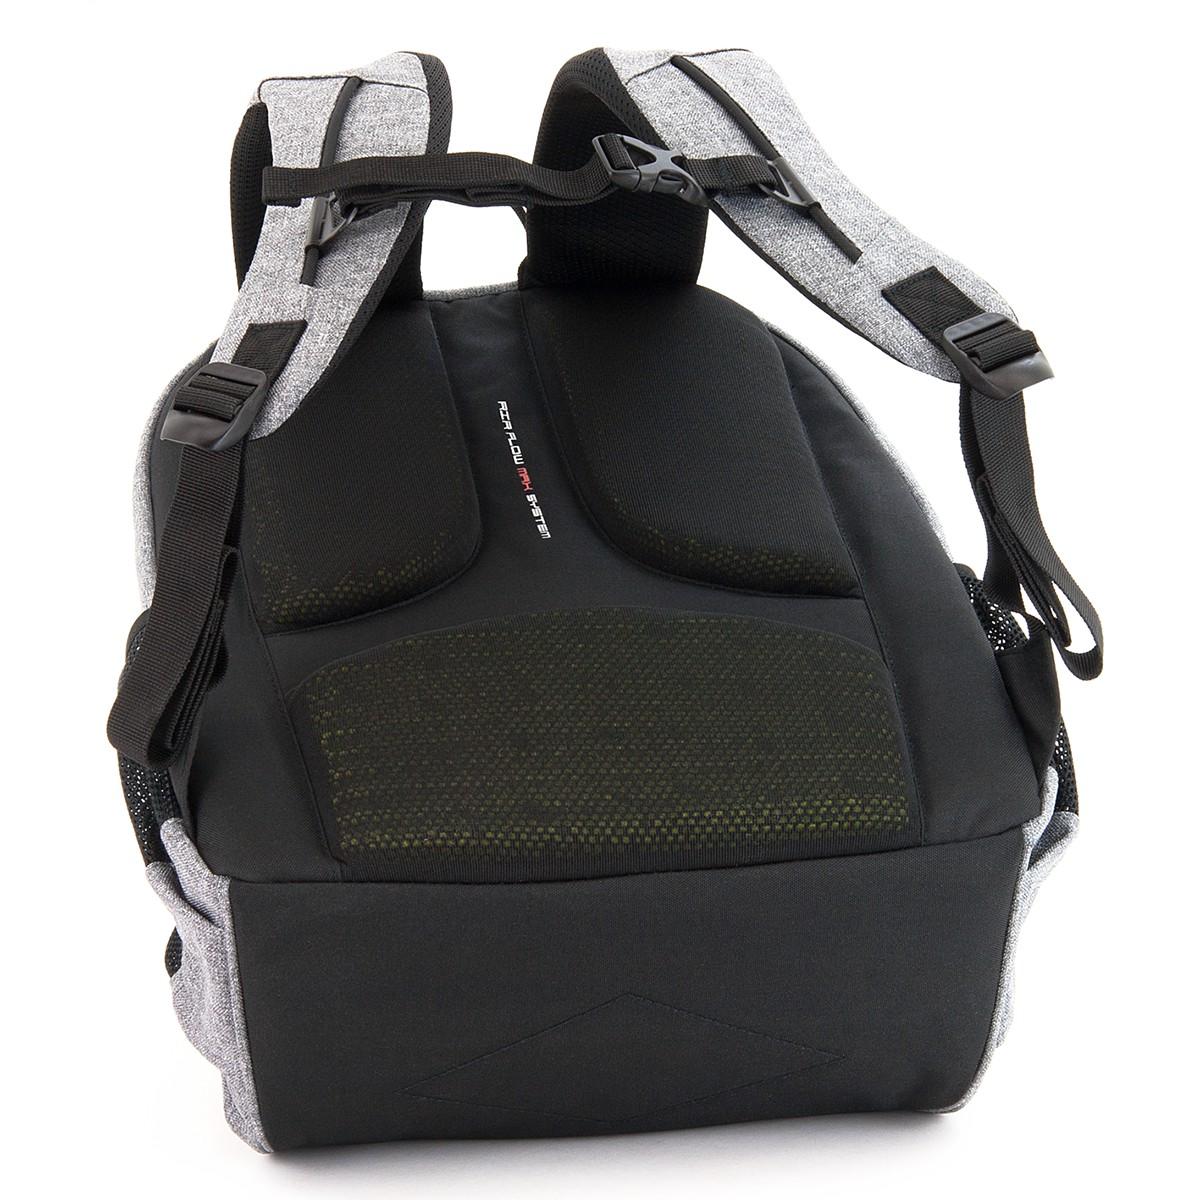 ARS UNA 08 ergonomikus hátizsák c741d96aca